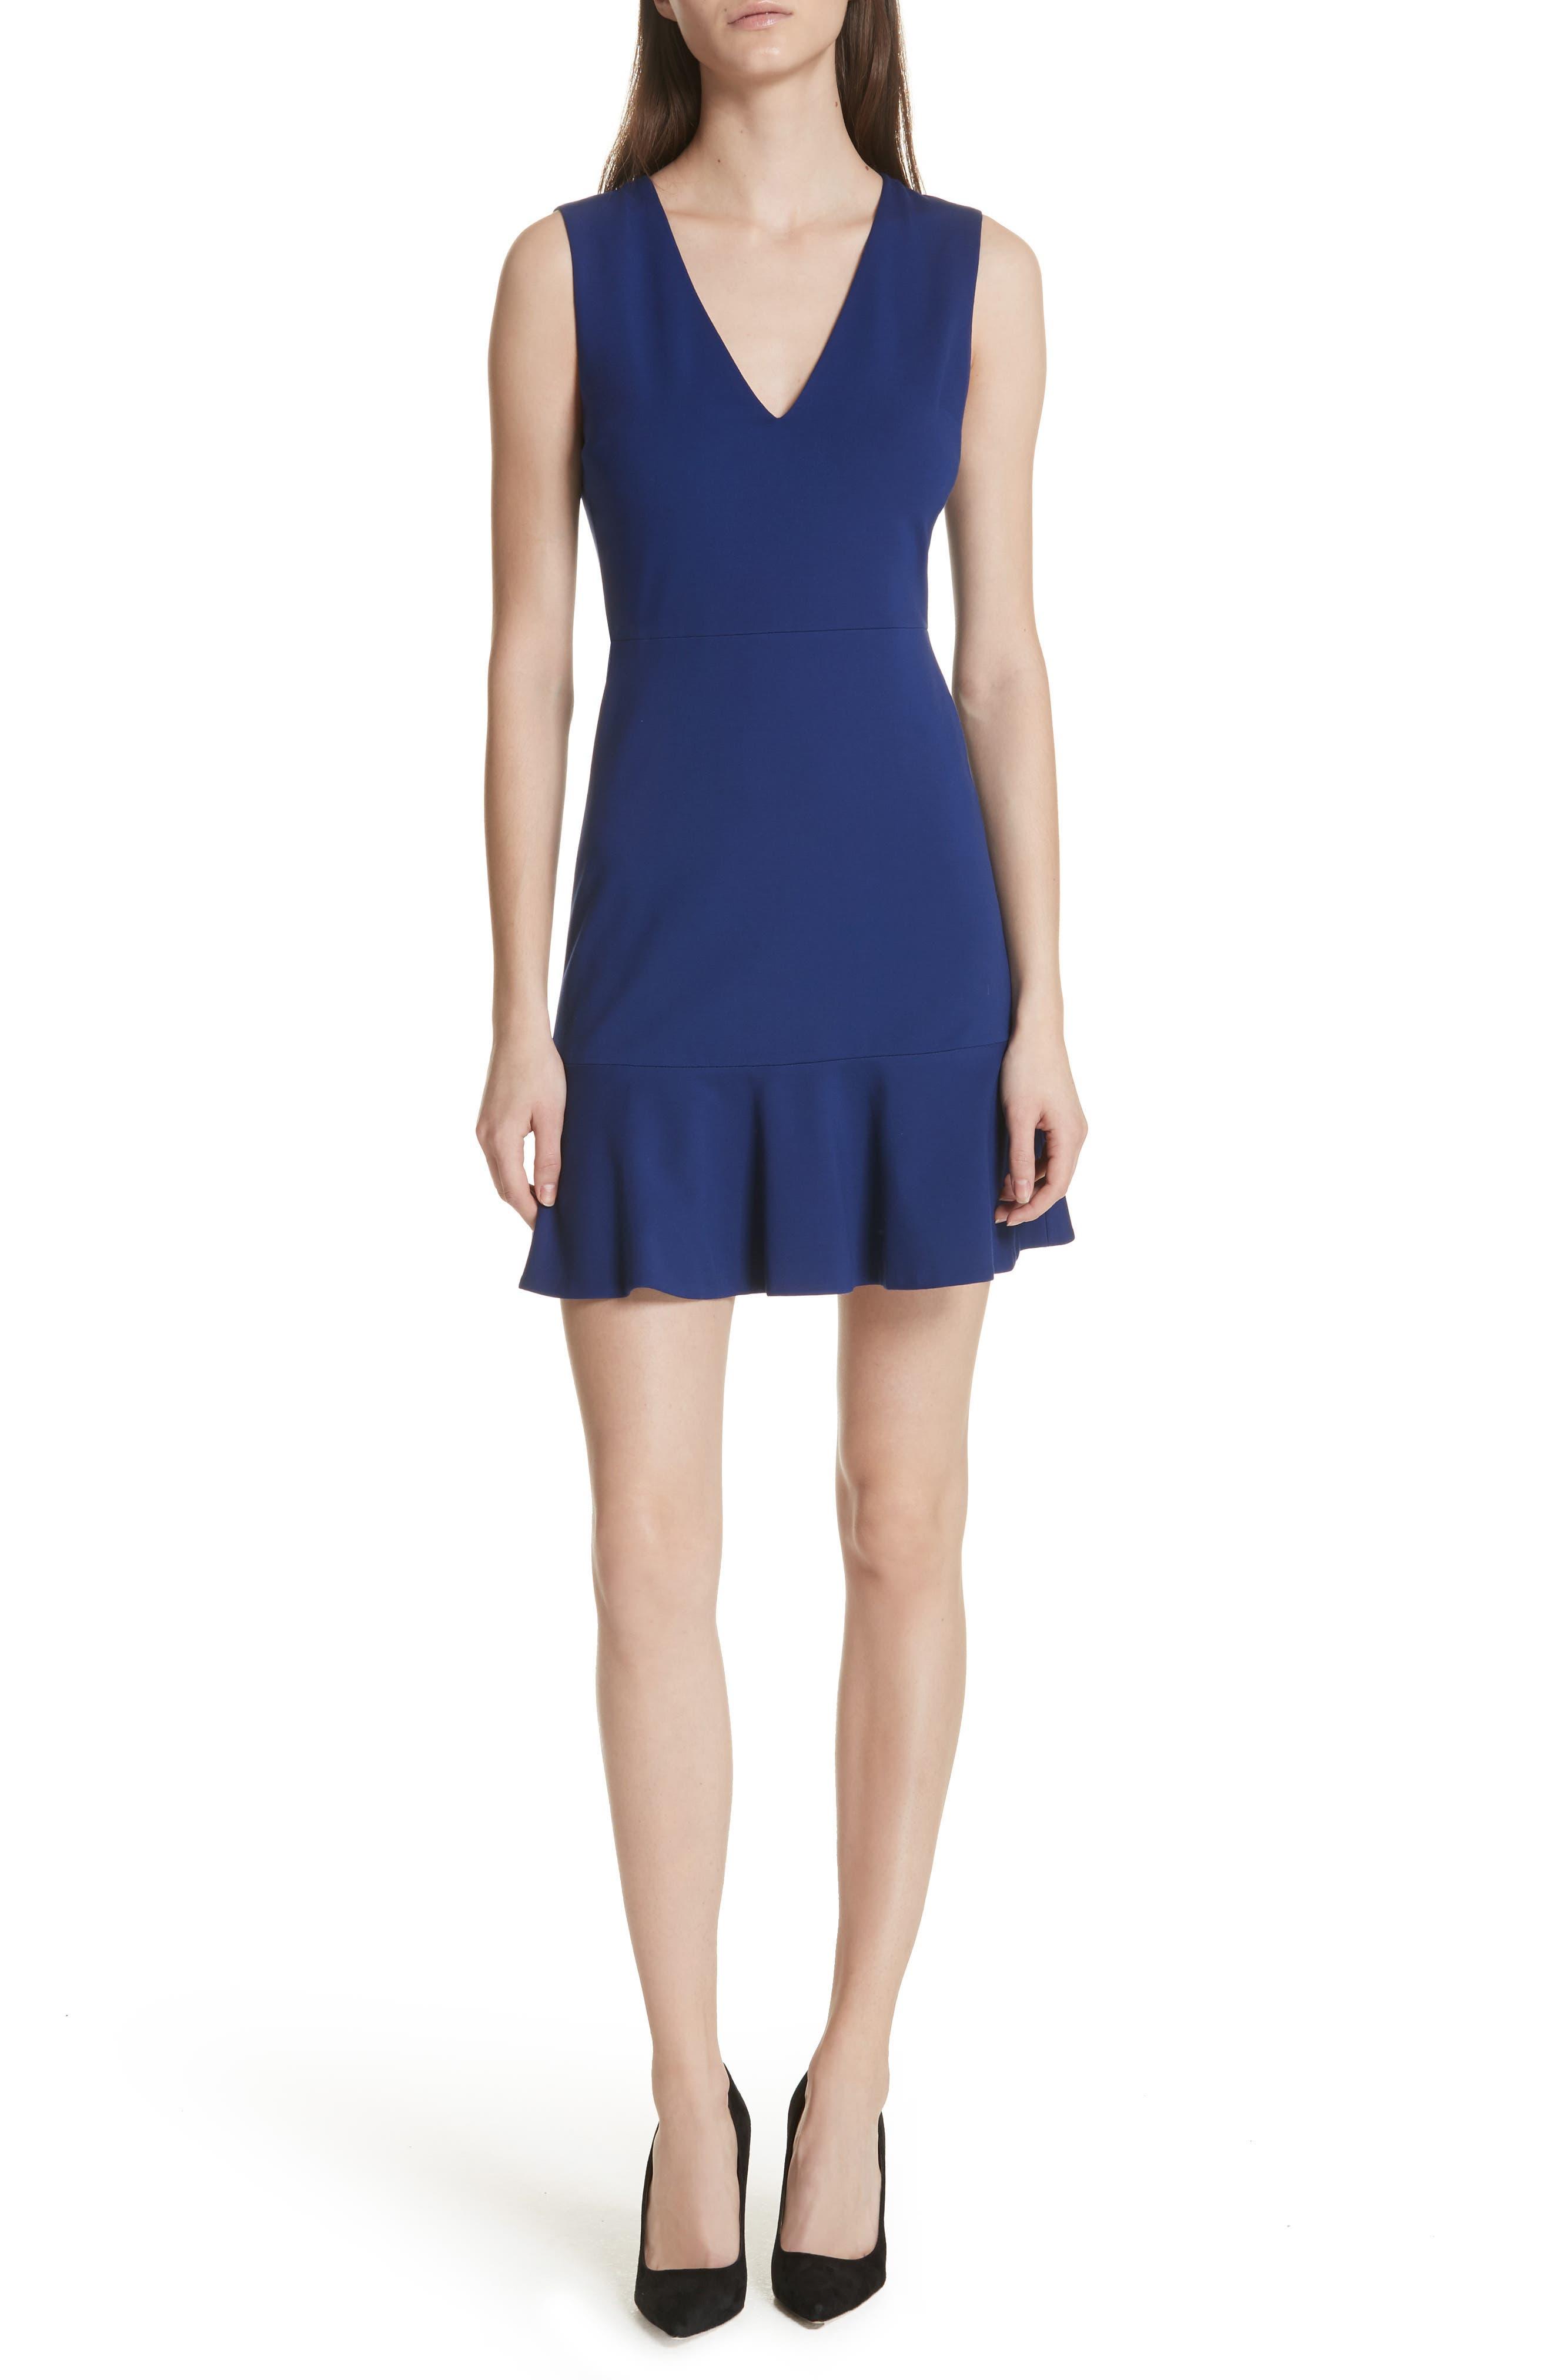 Main Image - Alice + Olivia Onella Peplum Hem Fit & Flare Dress